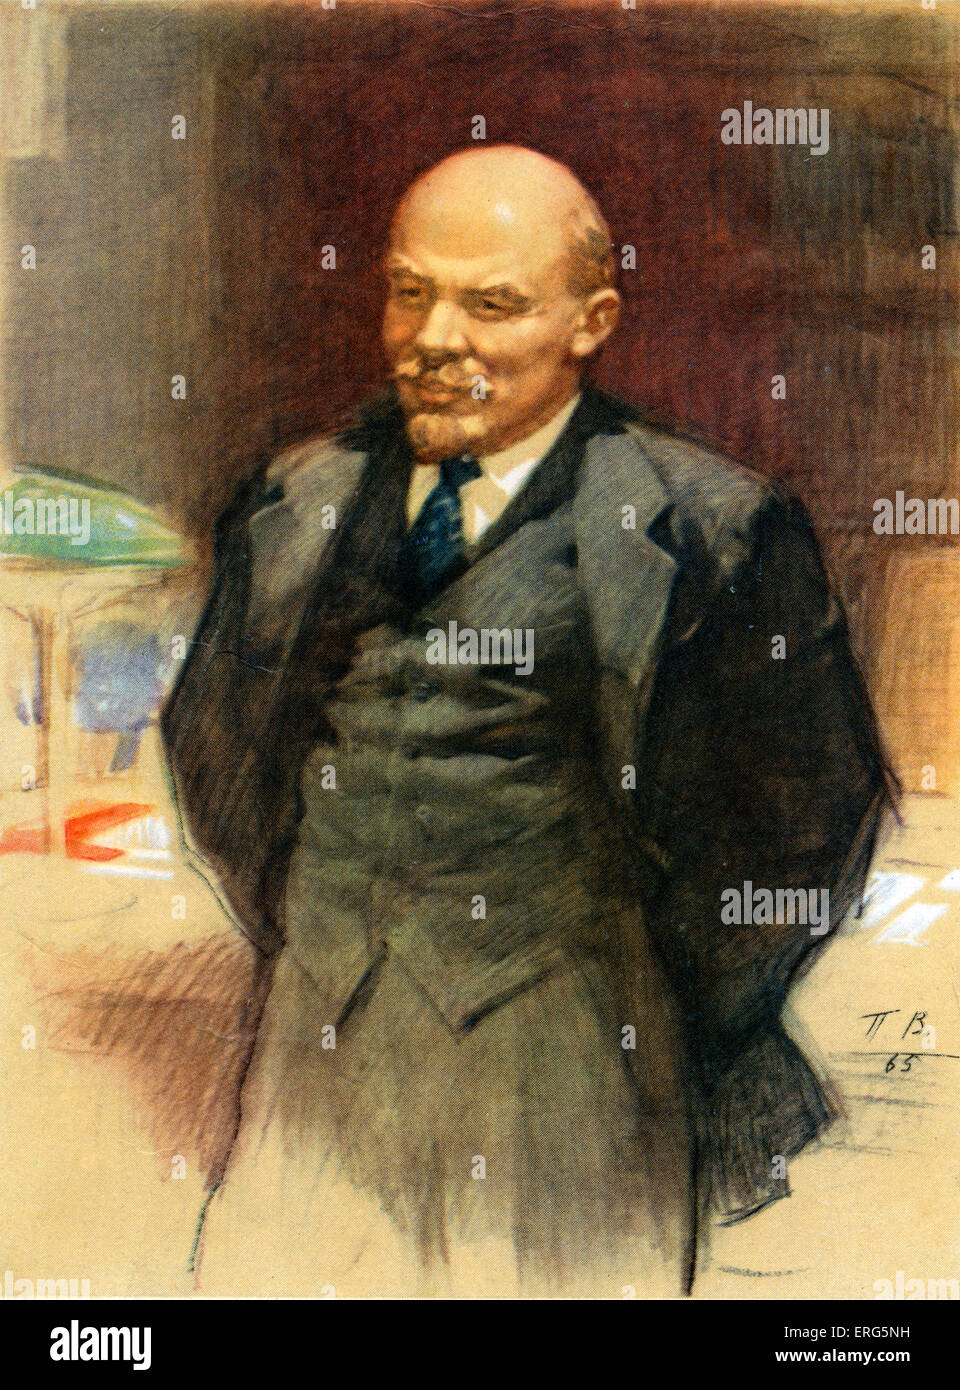 Vladmir Lenin, Russian  revolutionary and communist politician,  led the October Revolution of 1917 (1870- 1924). - Stock Image